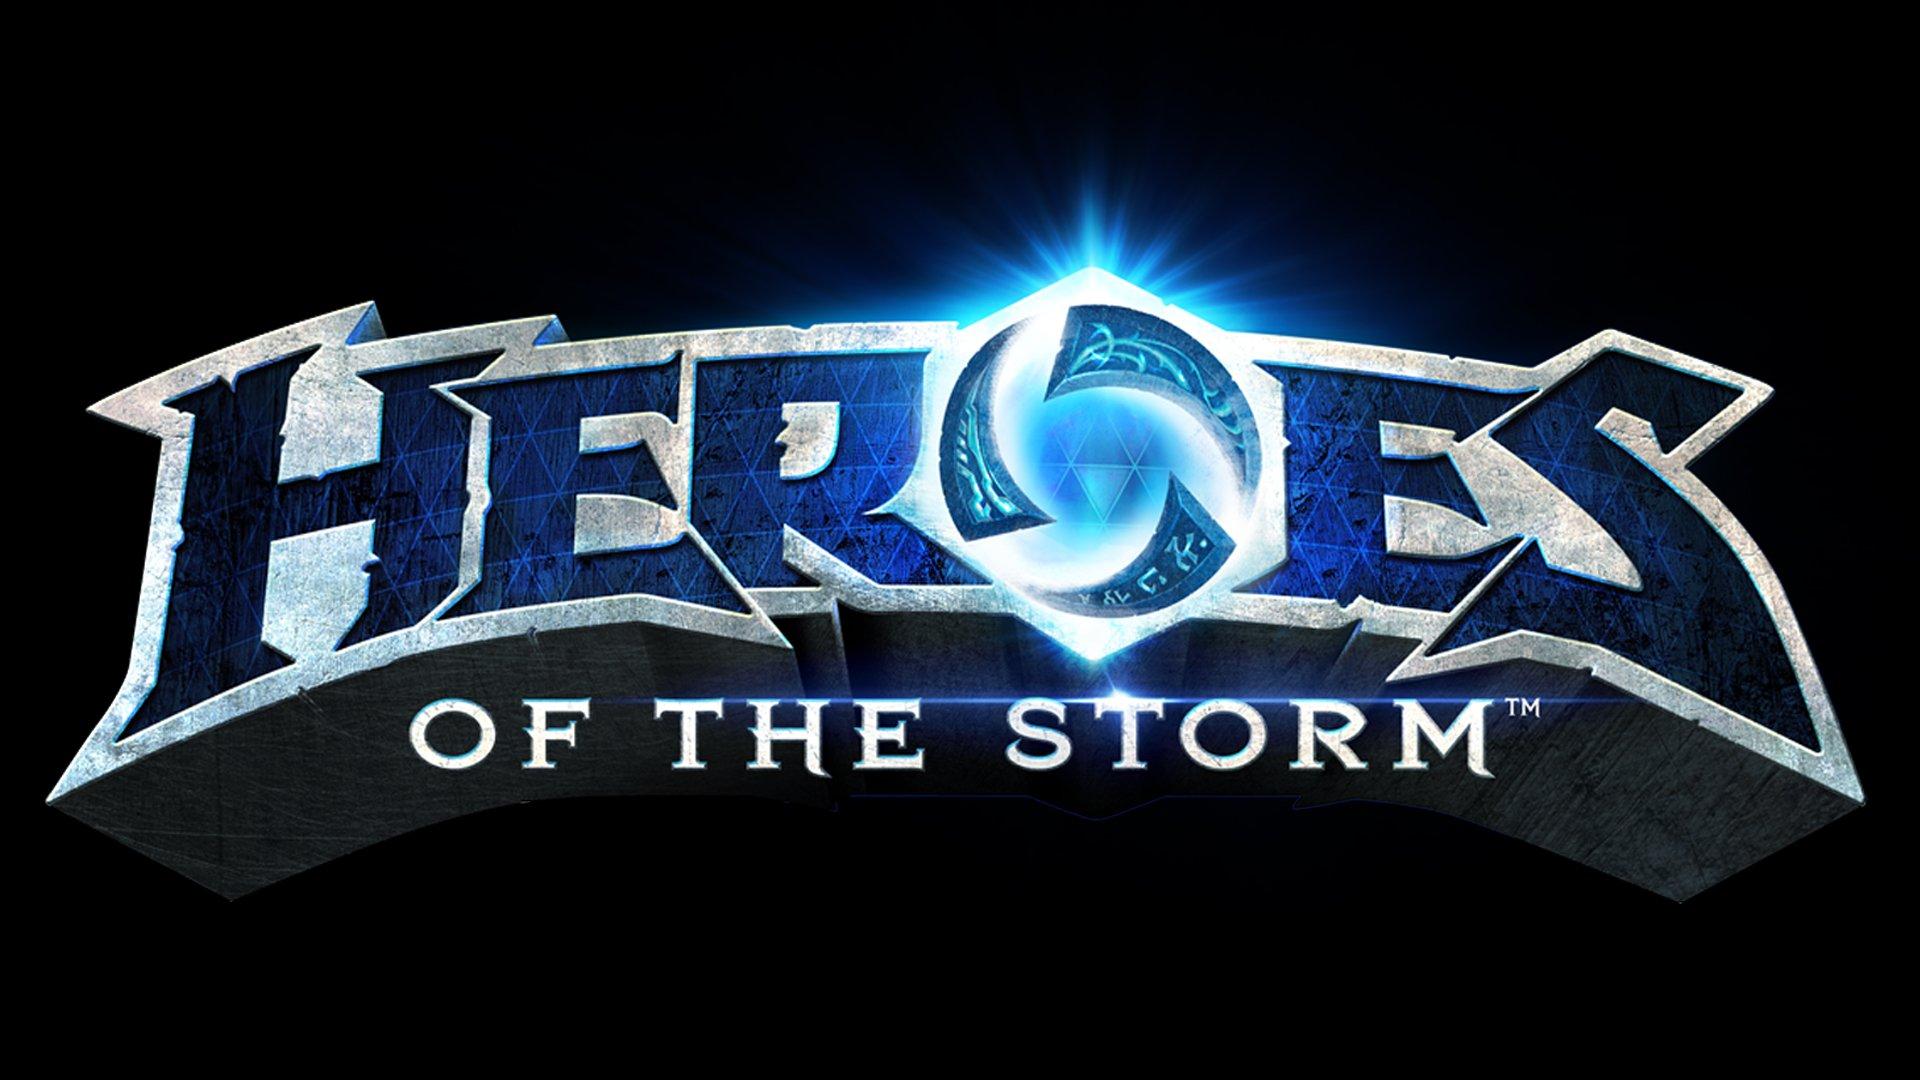 Fun play ) LoL Epic Fails +18по heroes of the storm!!!  - Изображение 1